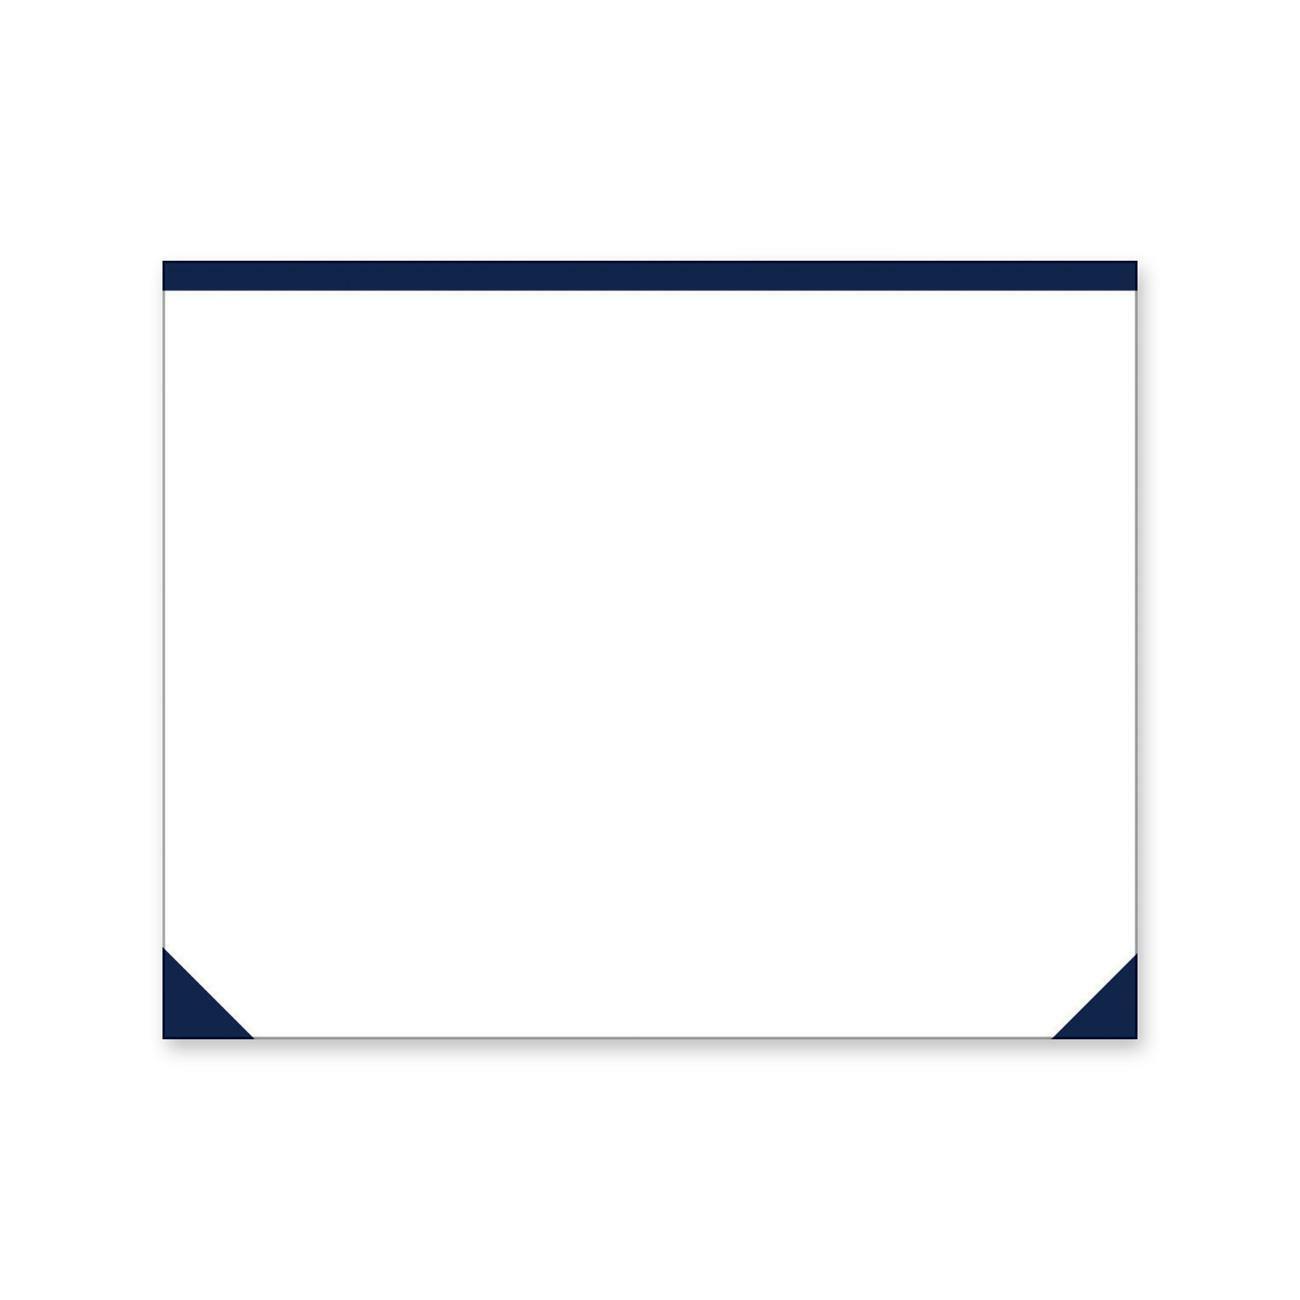 Peachy Blueline Eco Plain Desk Pad Rectangle 21 75 552 45 Mm Width X 17 431 80 Mm Depth 50 Sheets White Download Free Architecture Designs Barepgrimeyleaguecom